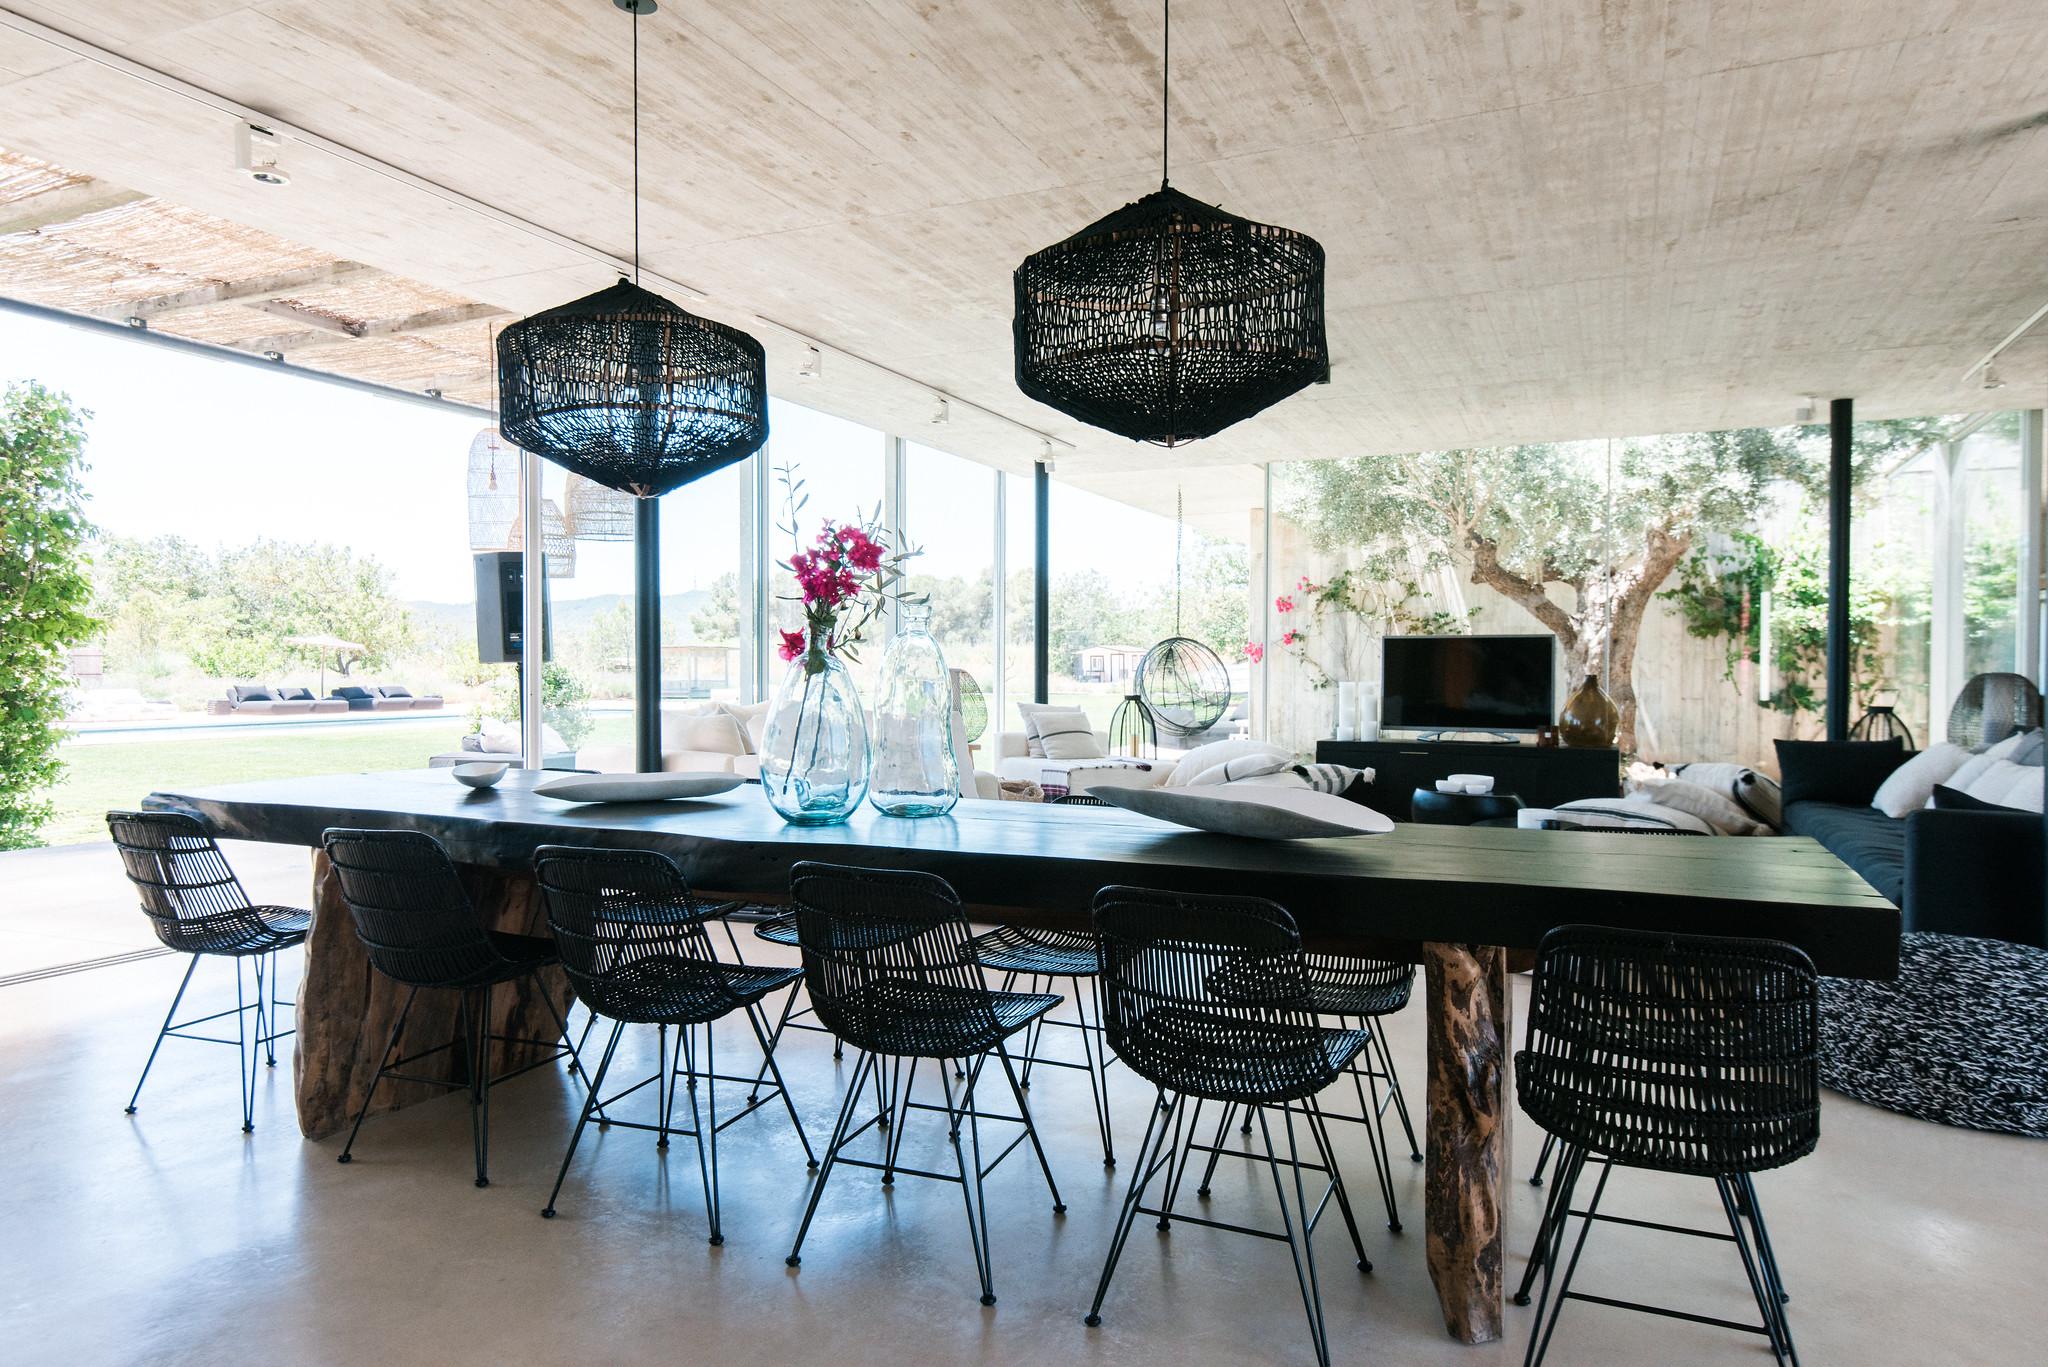 https://www.white-ibiza.com/wp-content/uploads/2020/06/white-ibiza-villas-casa-valentina-interior-dining-table.jpg